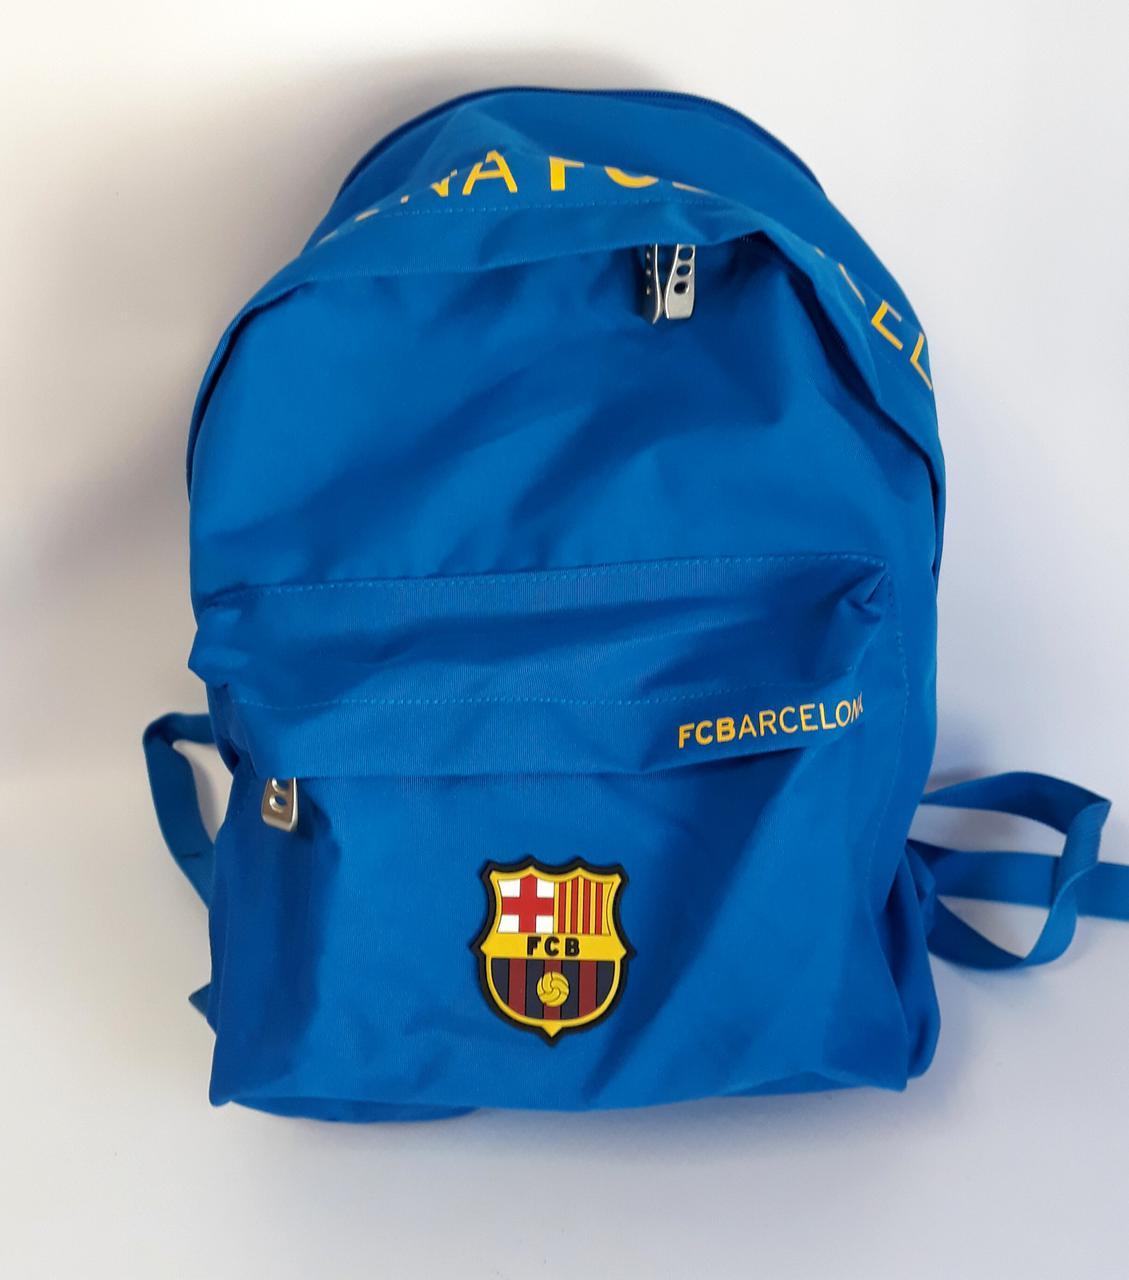 0ff7be880548 рюкзак Kite товары для школьников Olxua. рюкзак Fc Barcelona Bc17 1001m  Kite германия в категории рюкзаки